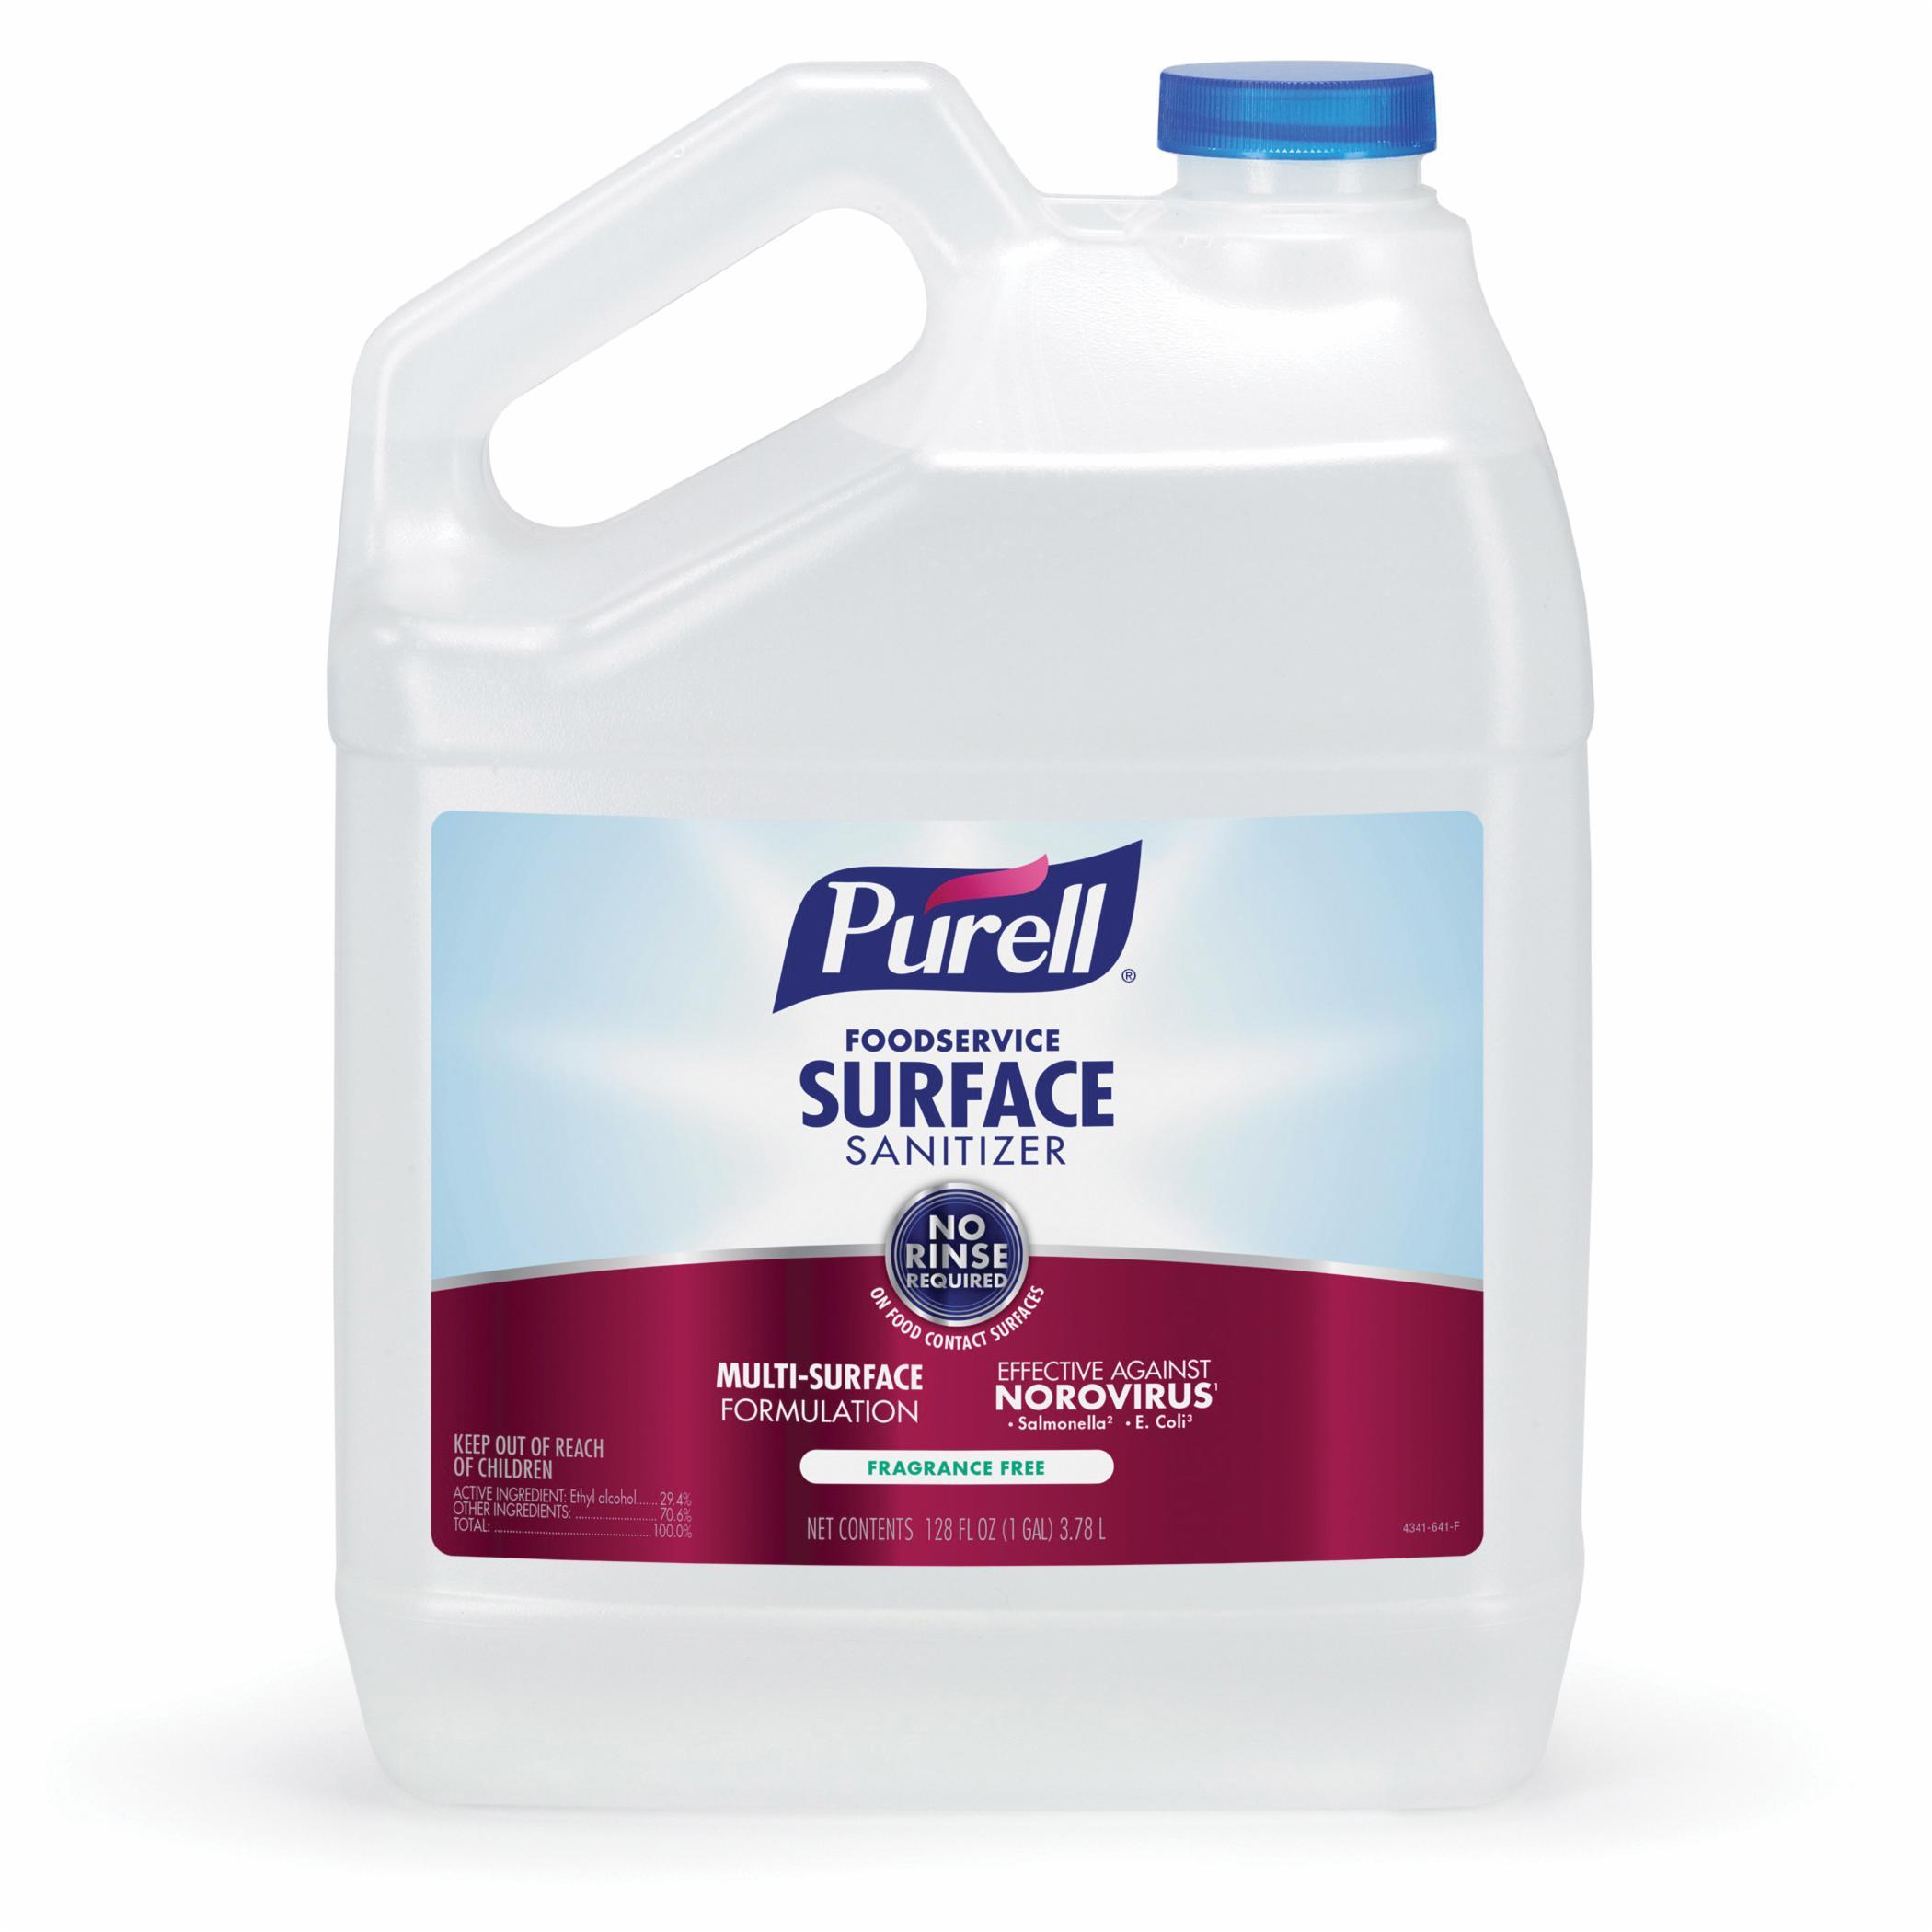 PURELL® 3341-12 Surface Sanitizer, 32 fl-oz Spray Bottle, 12.6 to 12.9, Liquid, Fragrance Free